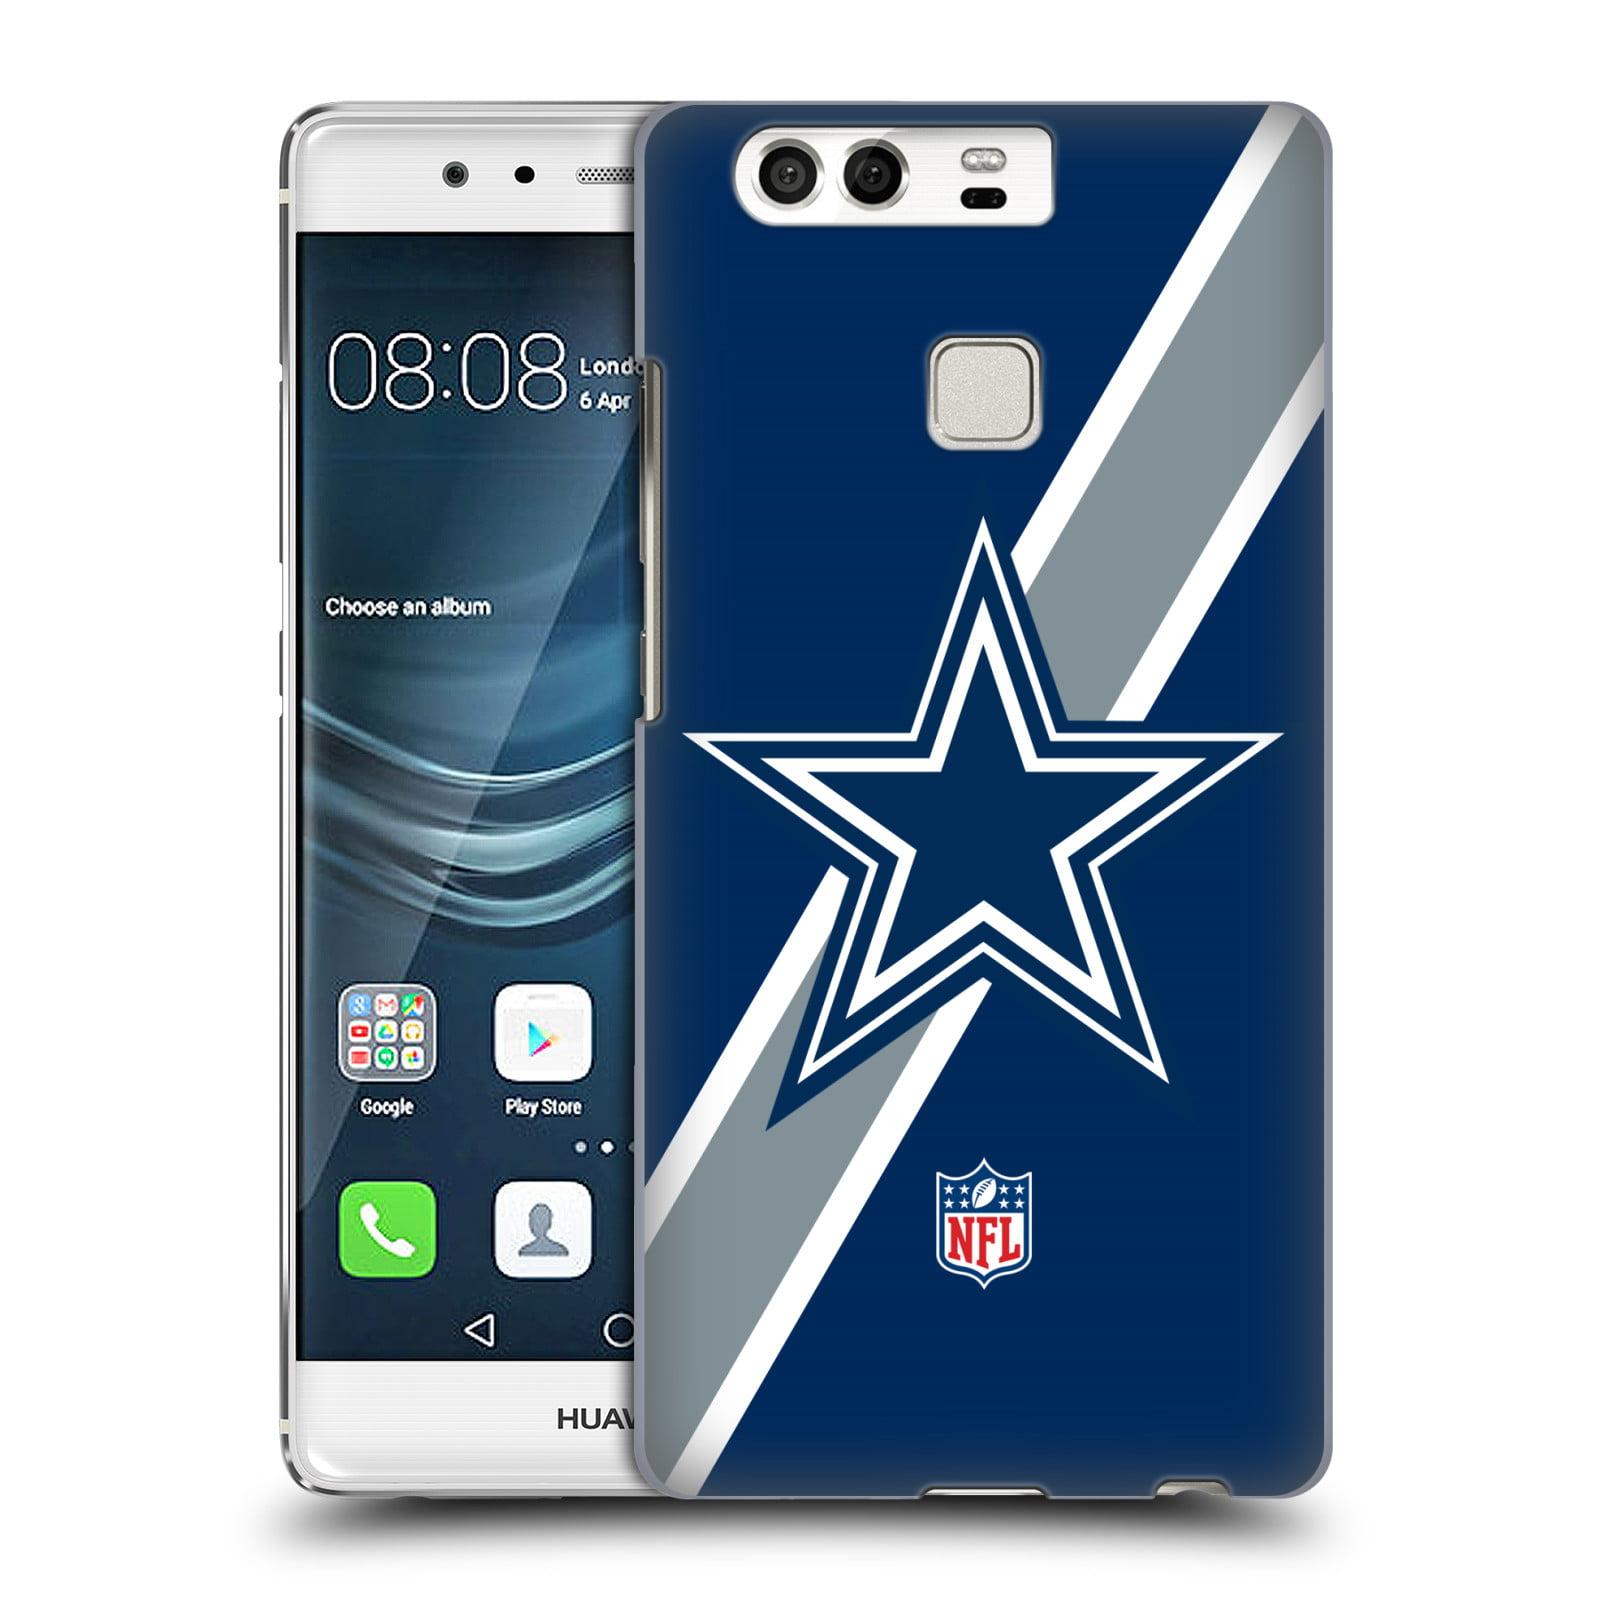 OFFICIAL NFL DALLAS COWBOYS LOGO HARD BACK CASE FOR HUAWEI PHONES 1